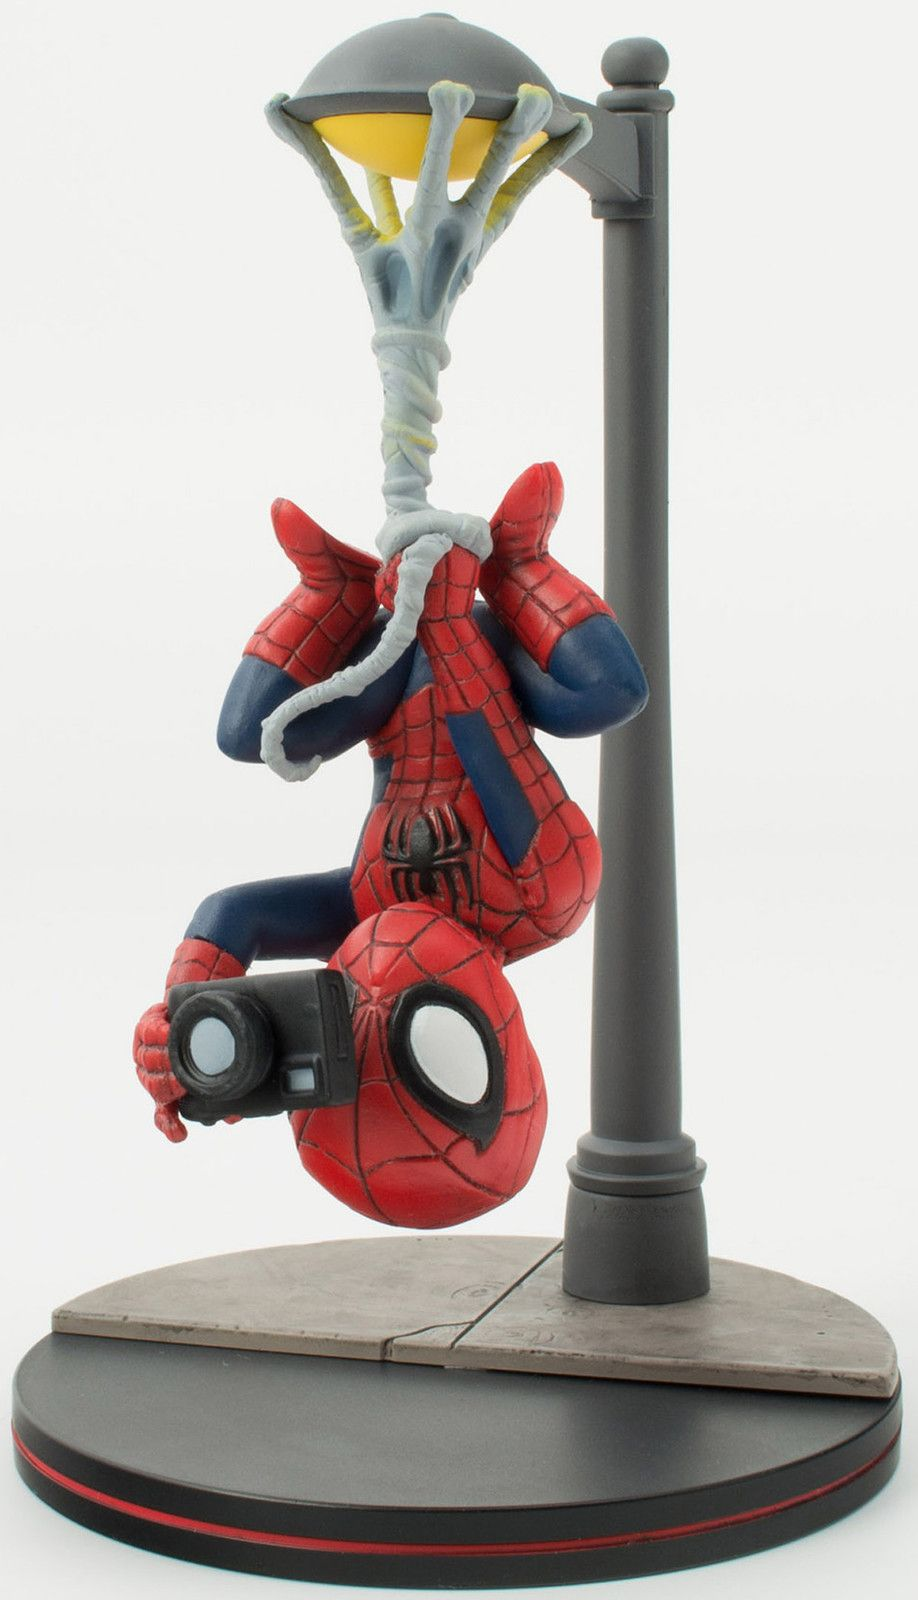 Фигура Q-Fig: Marvel Comics - Spider-Man, 14 cm - 1